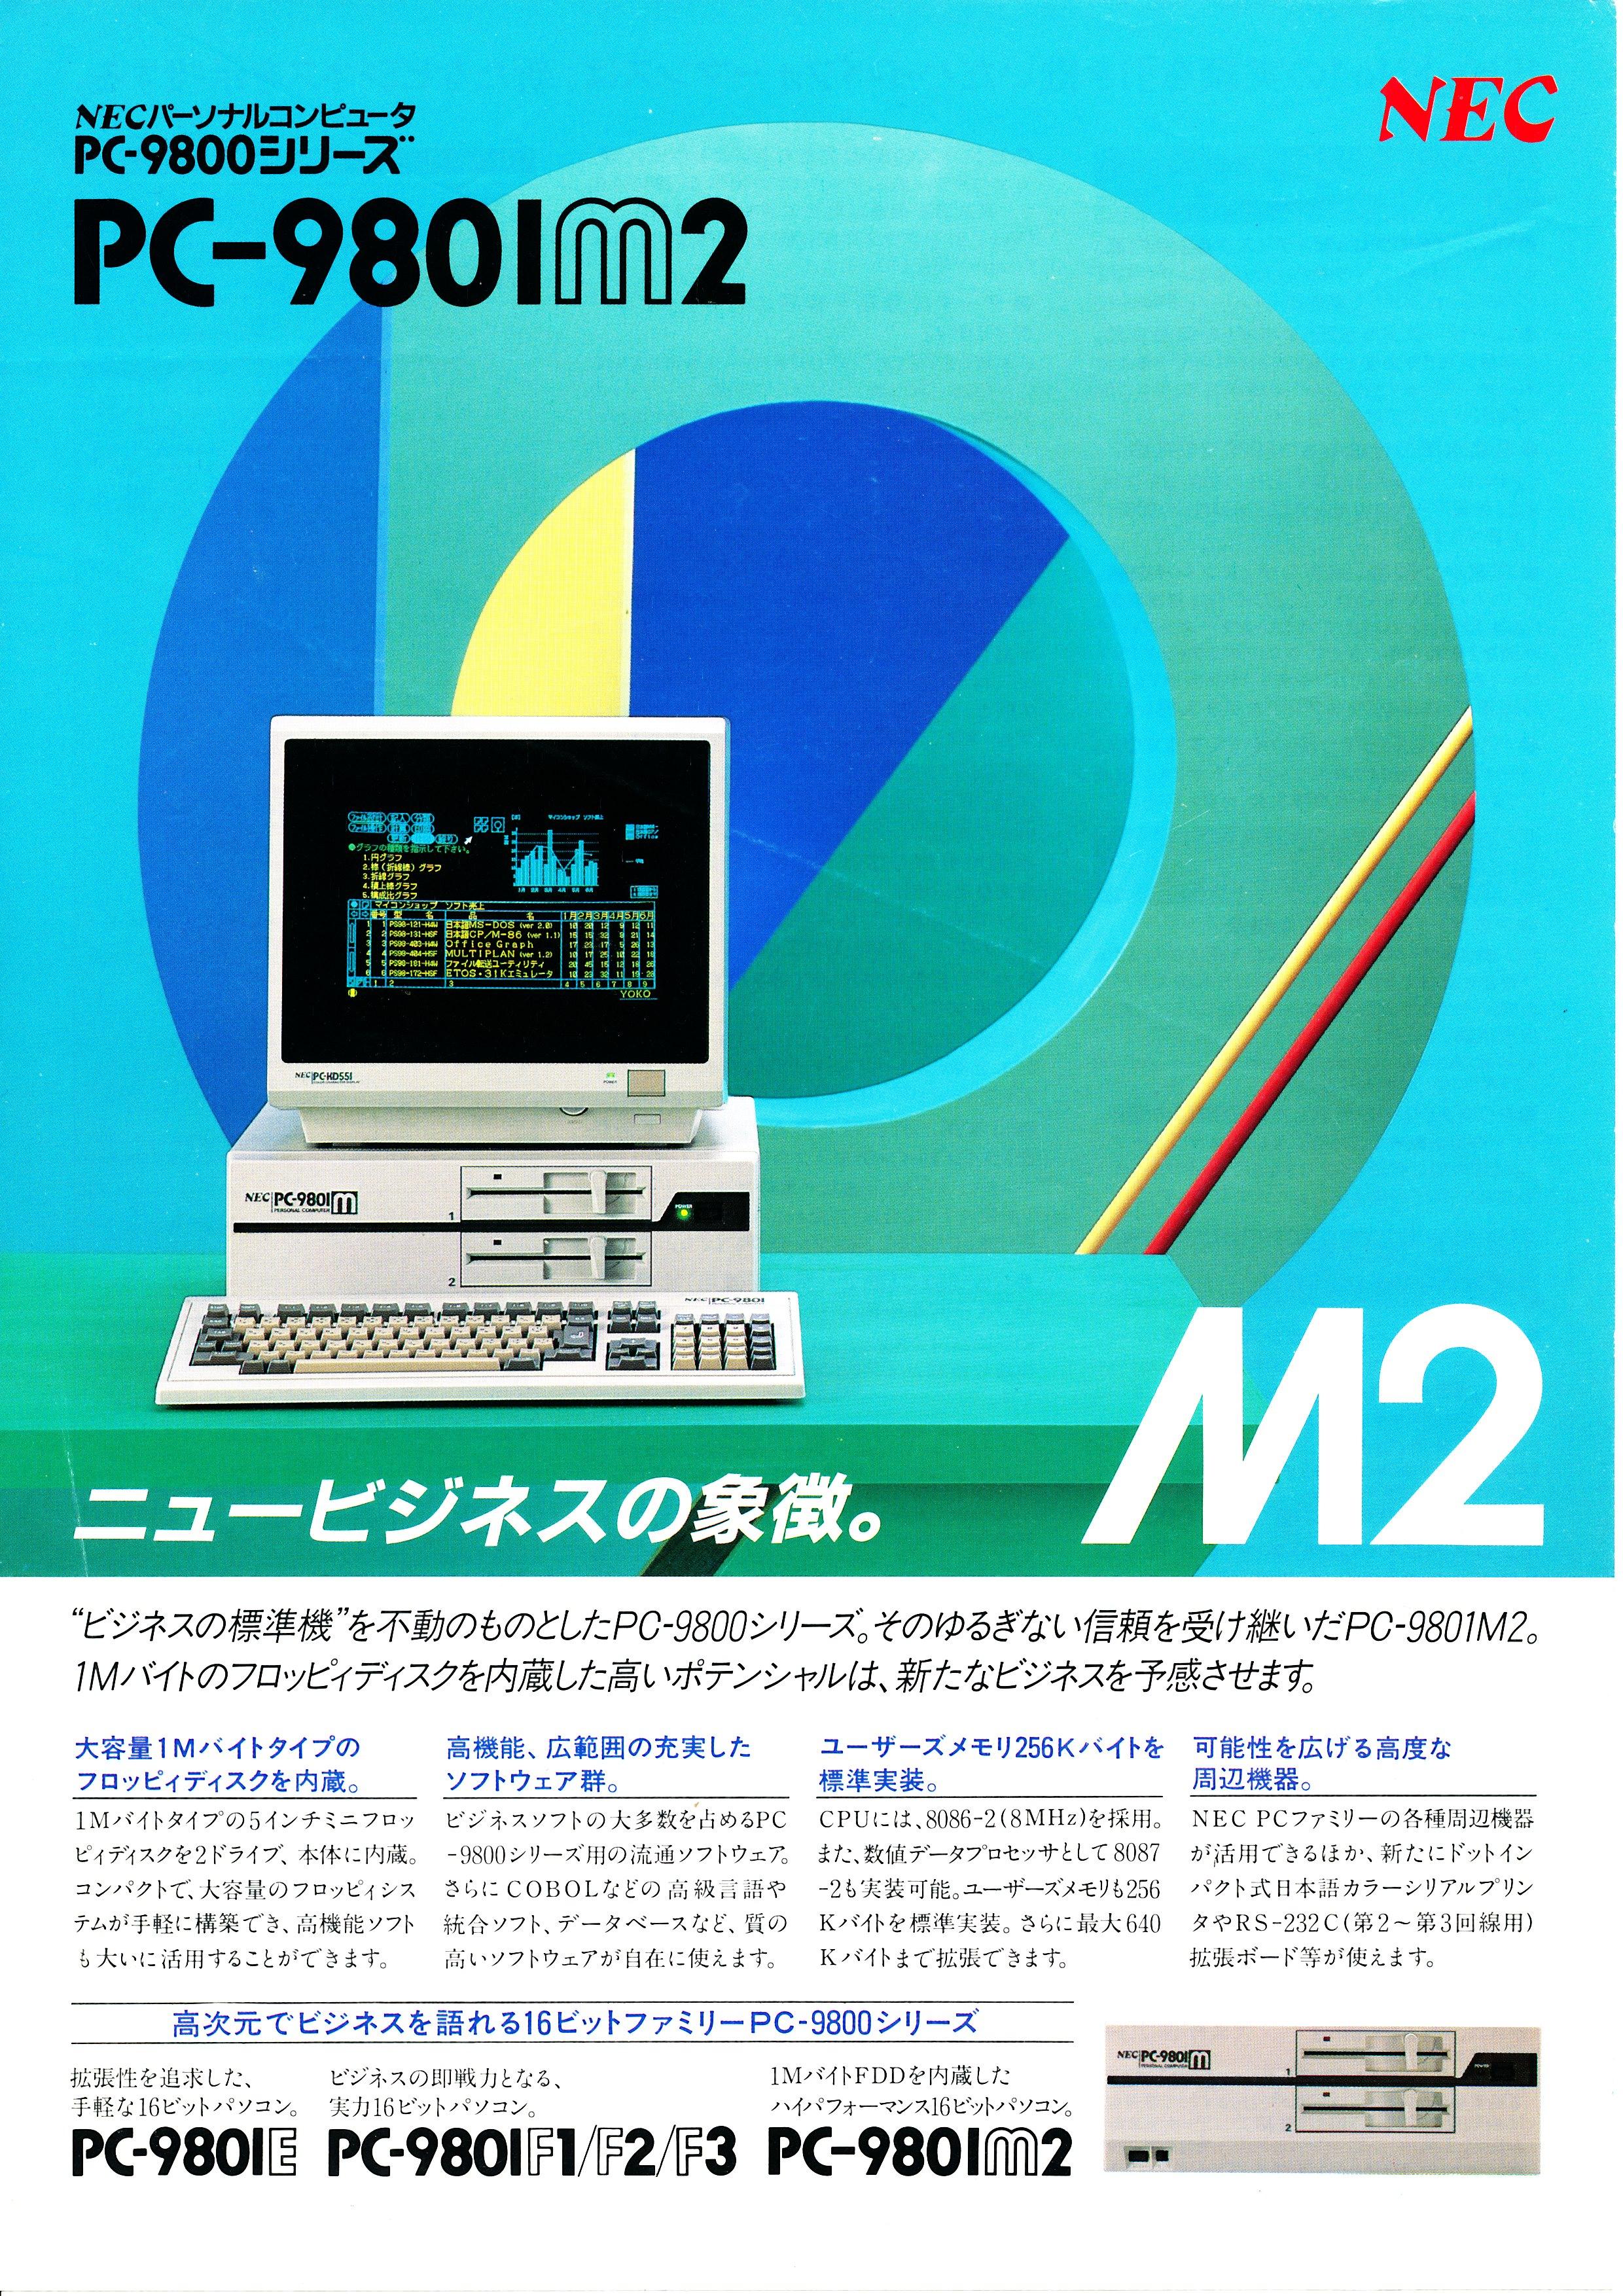 PC-9801m2 P1